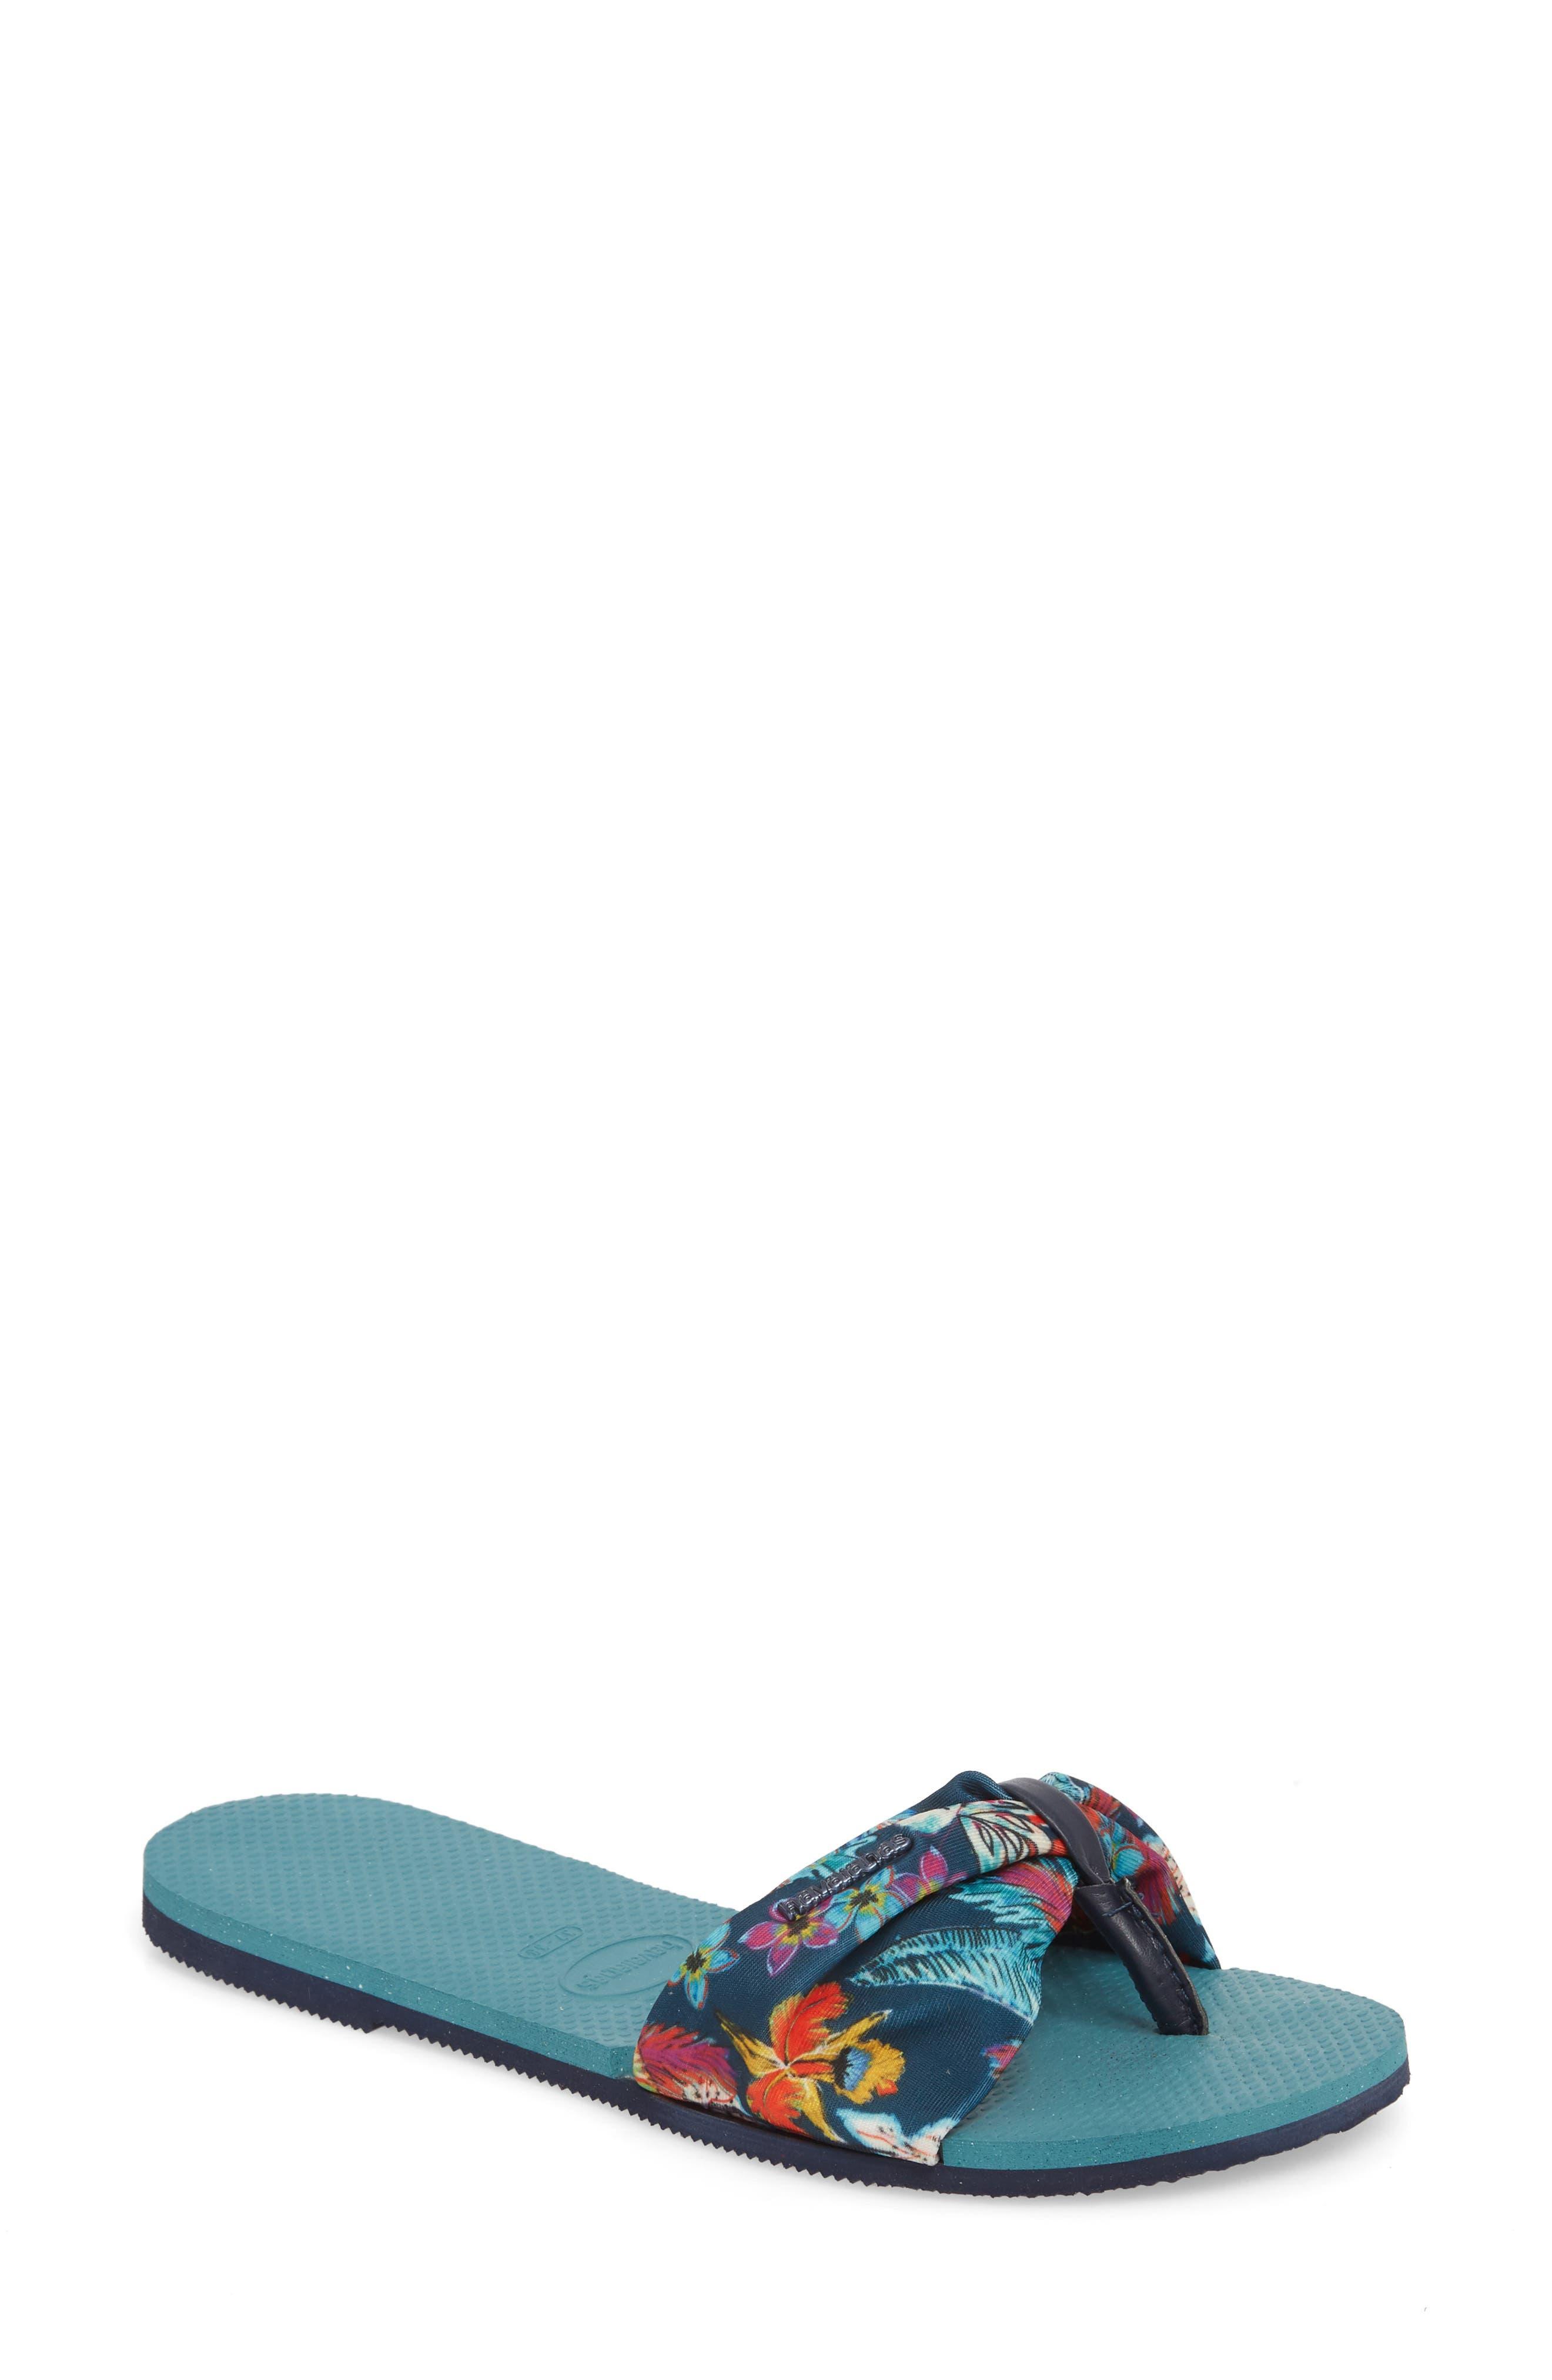 HAVAIANAS You Saint Tropez Sandal in Mineral Blue